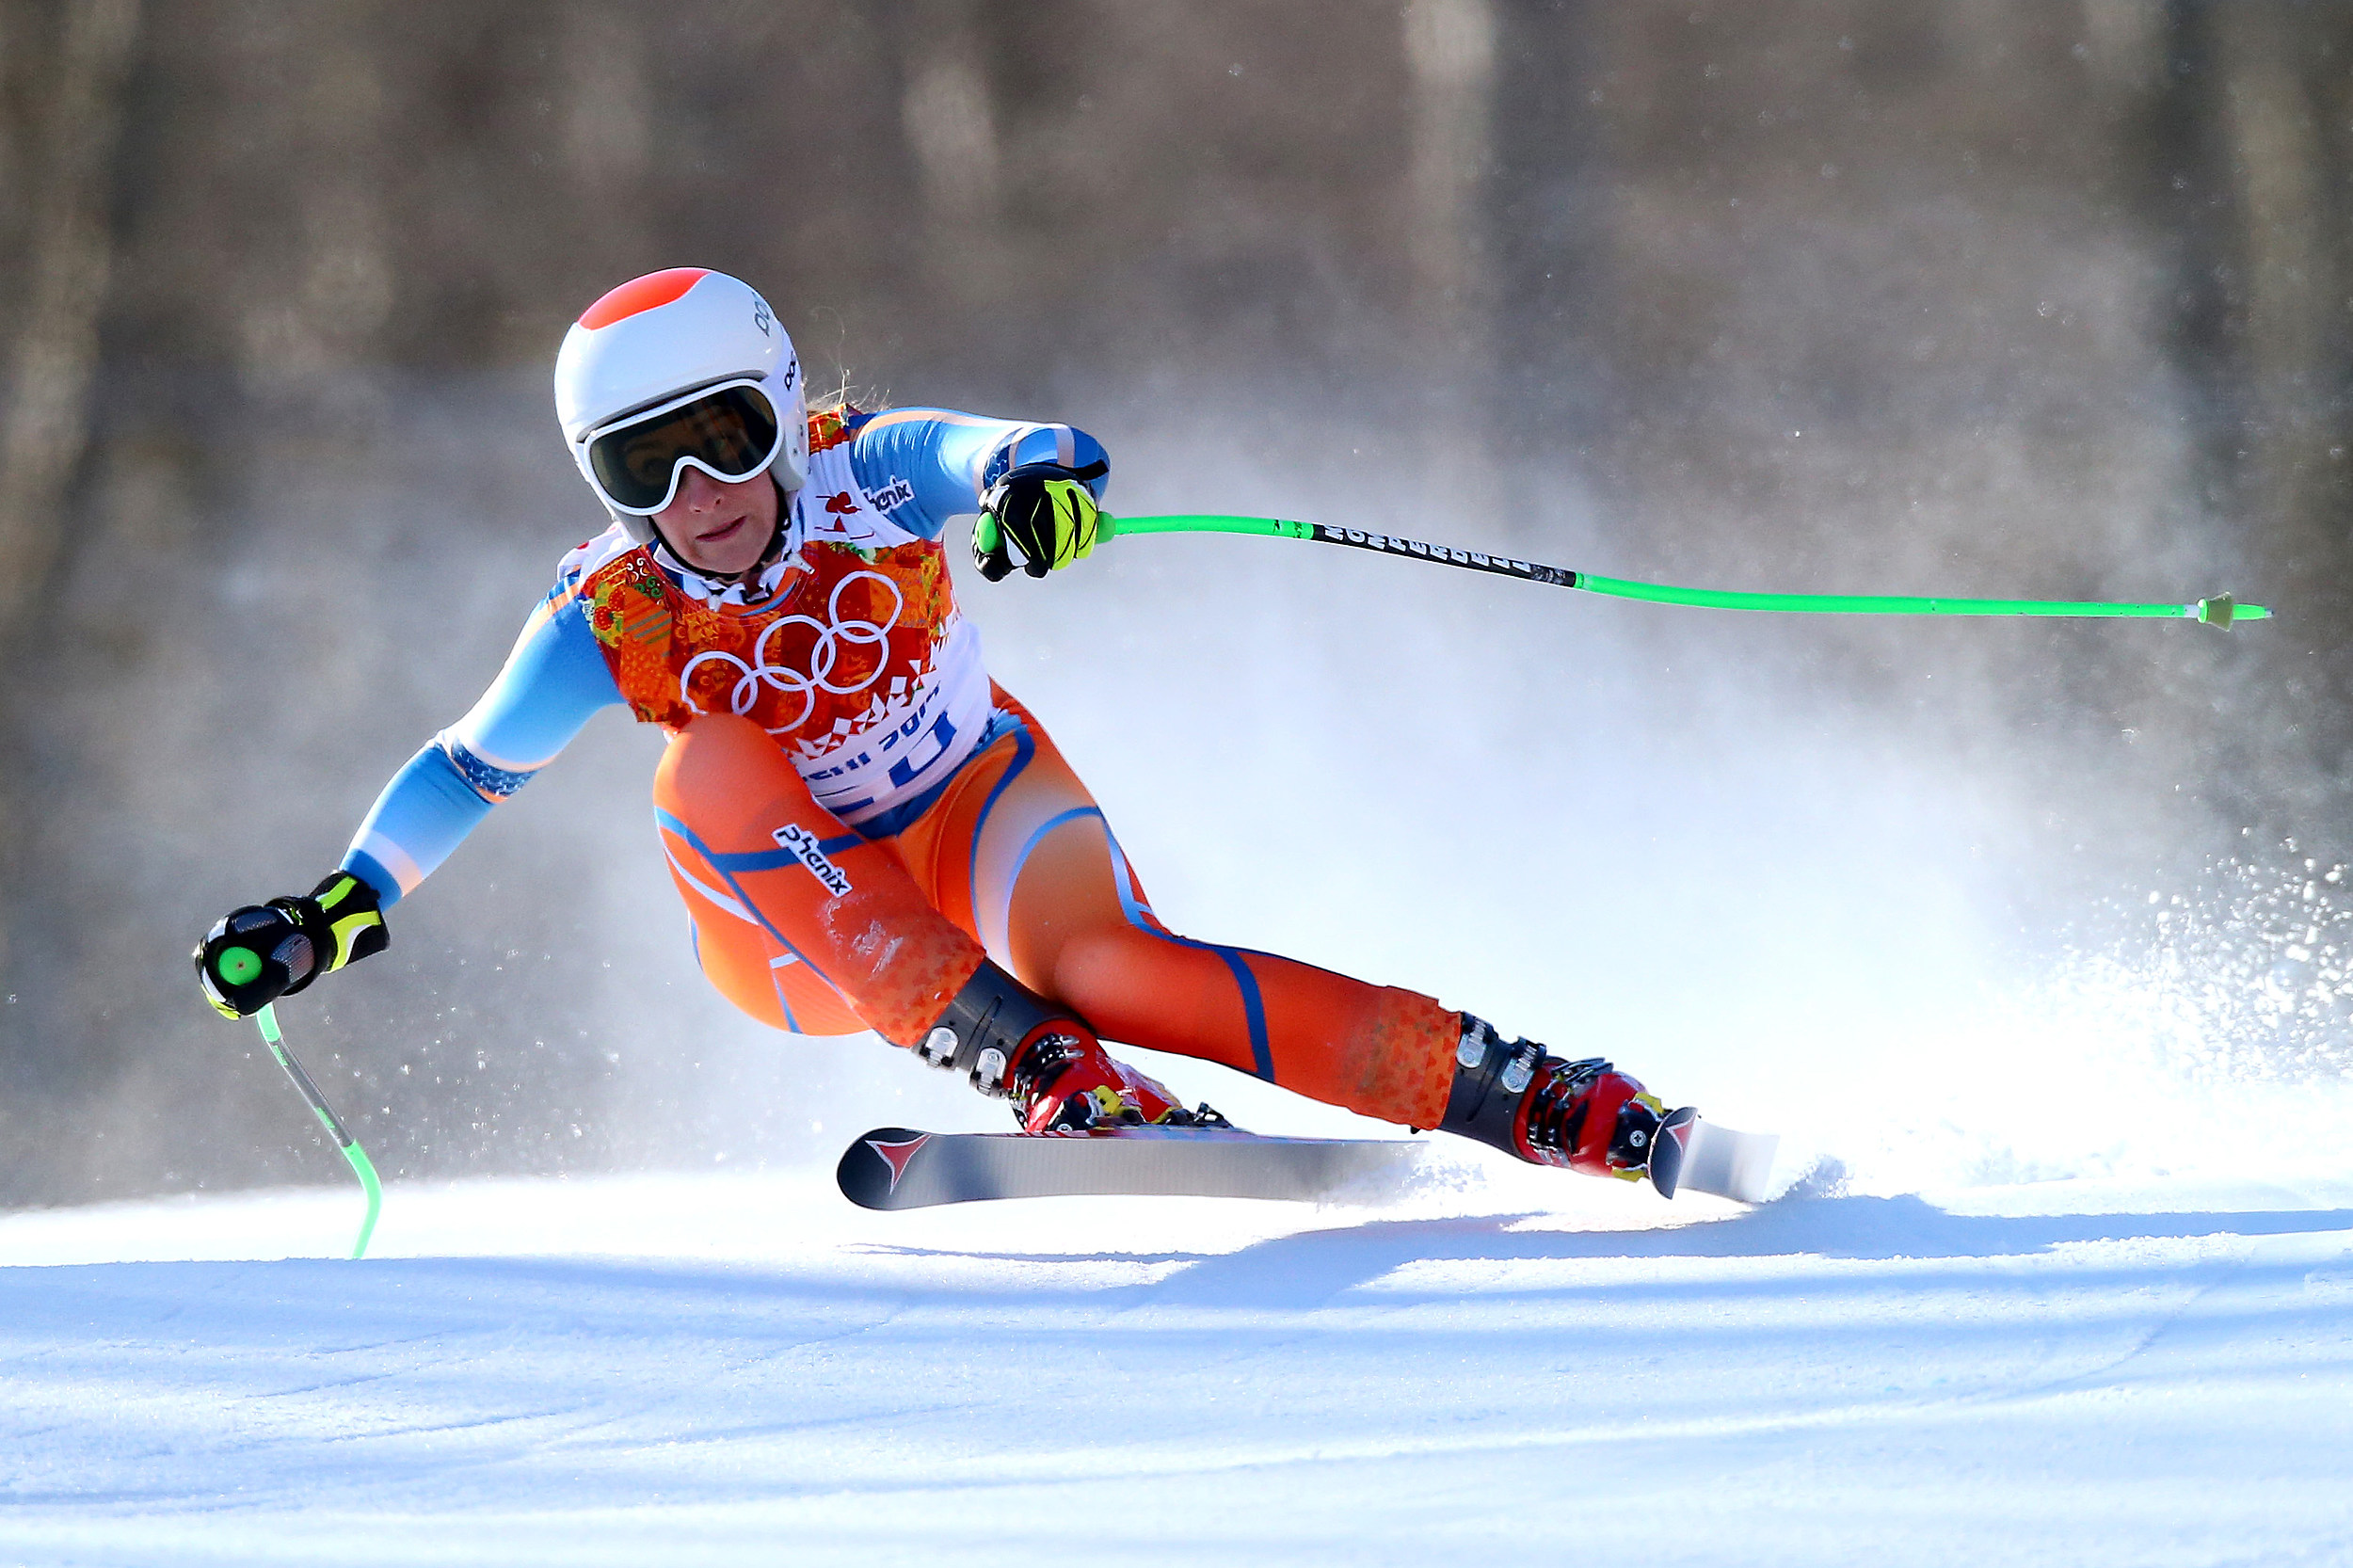 lebanese olympic skier topless photo